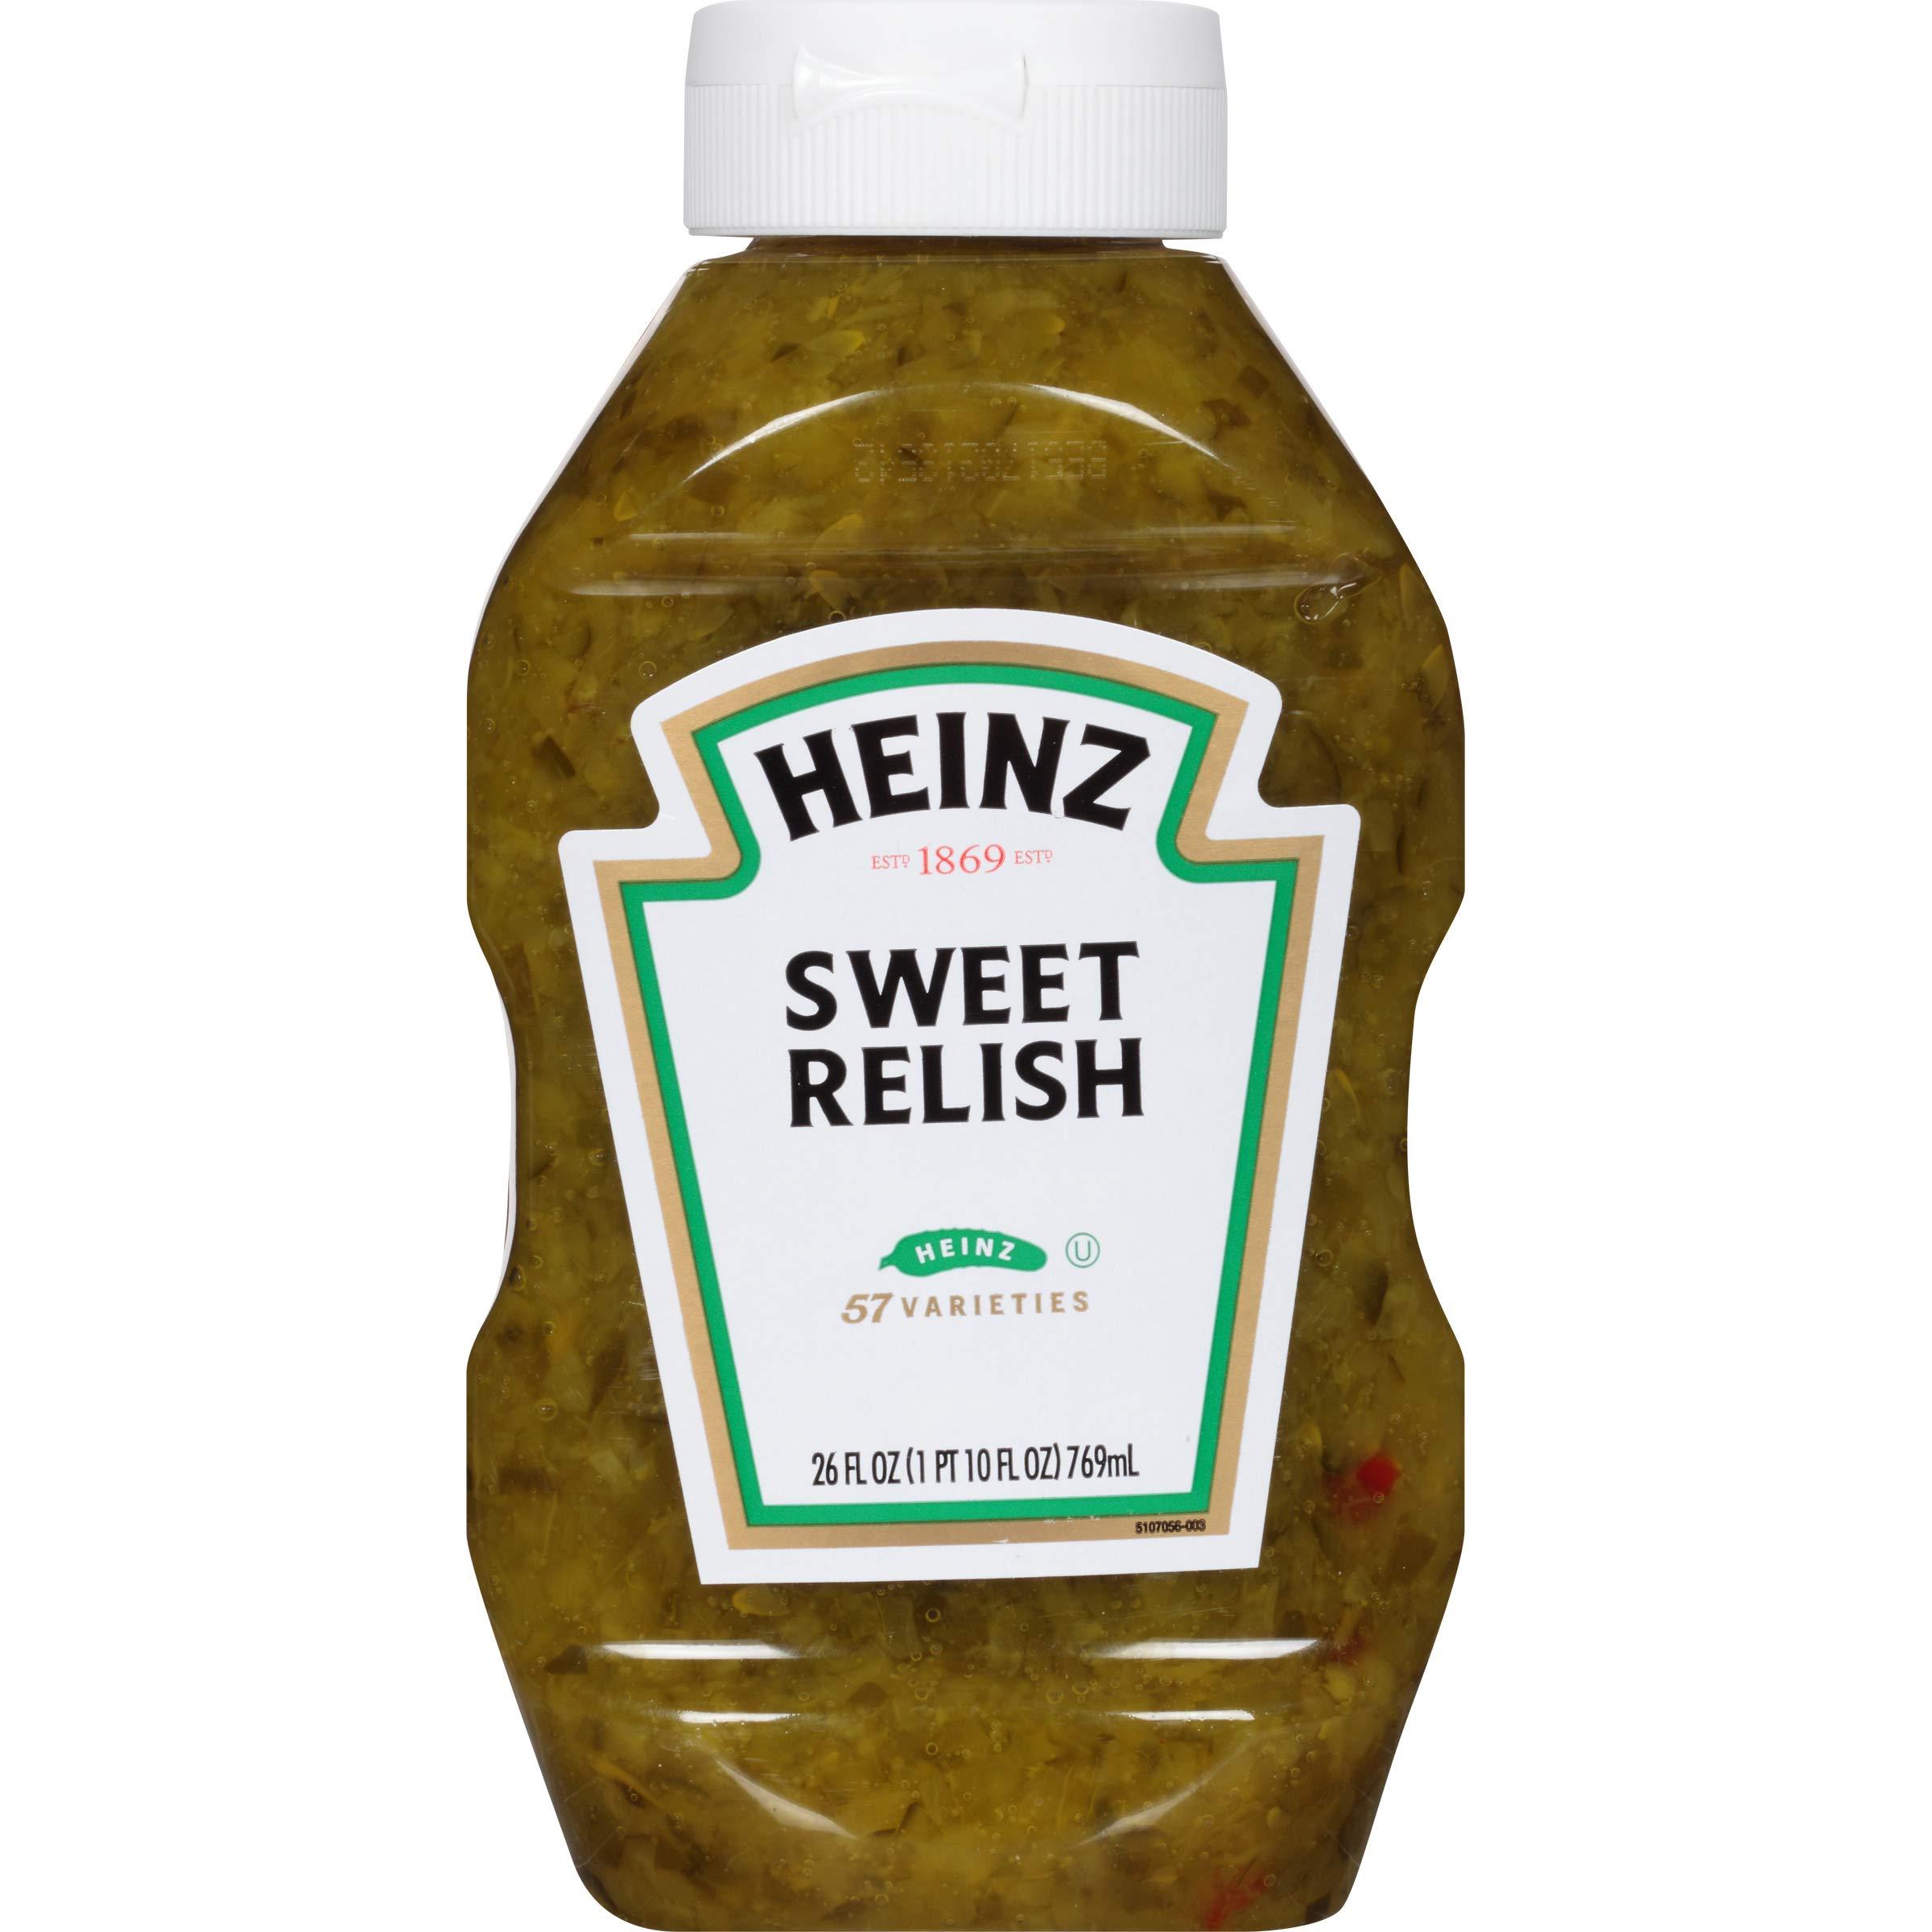 Heinz Sweet Relish, 26 fl oz Bottles